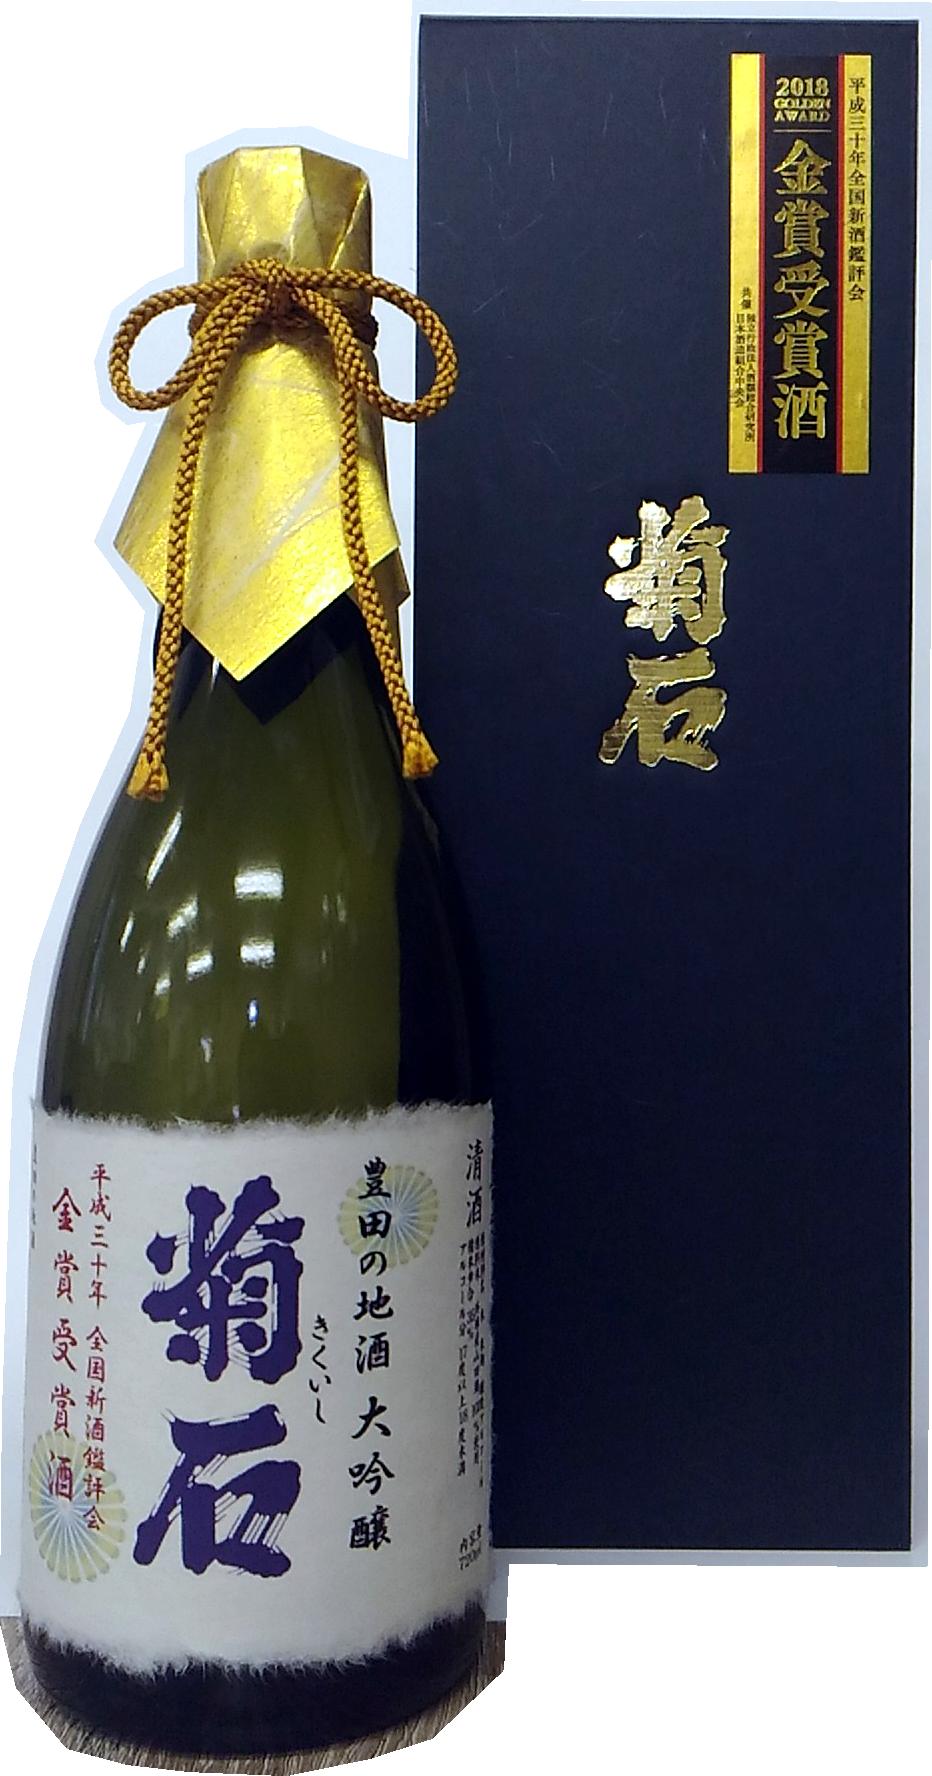 平成30年全国新酒鑑評会 金賞受賞 新井杜氏渾身の酒です